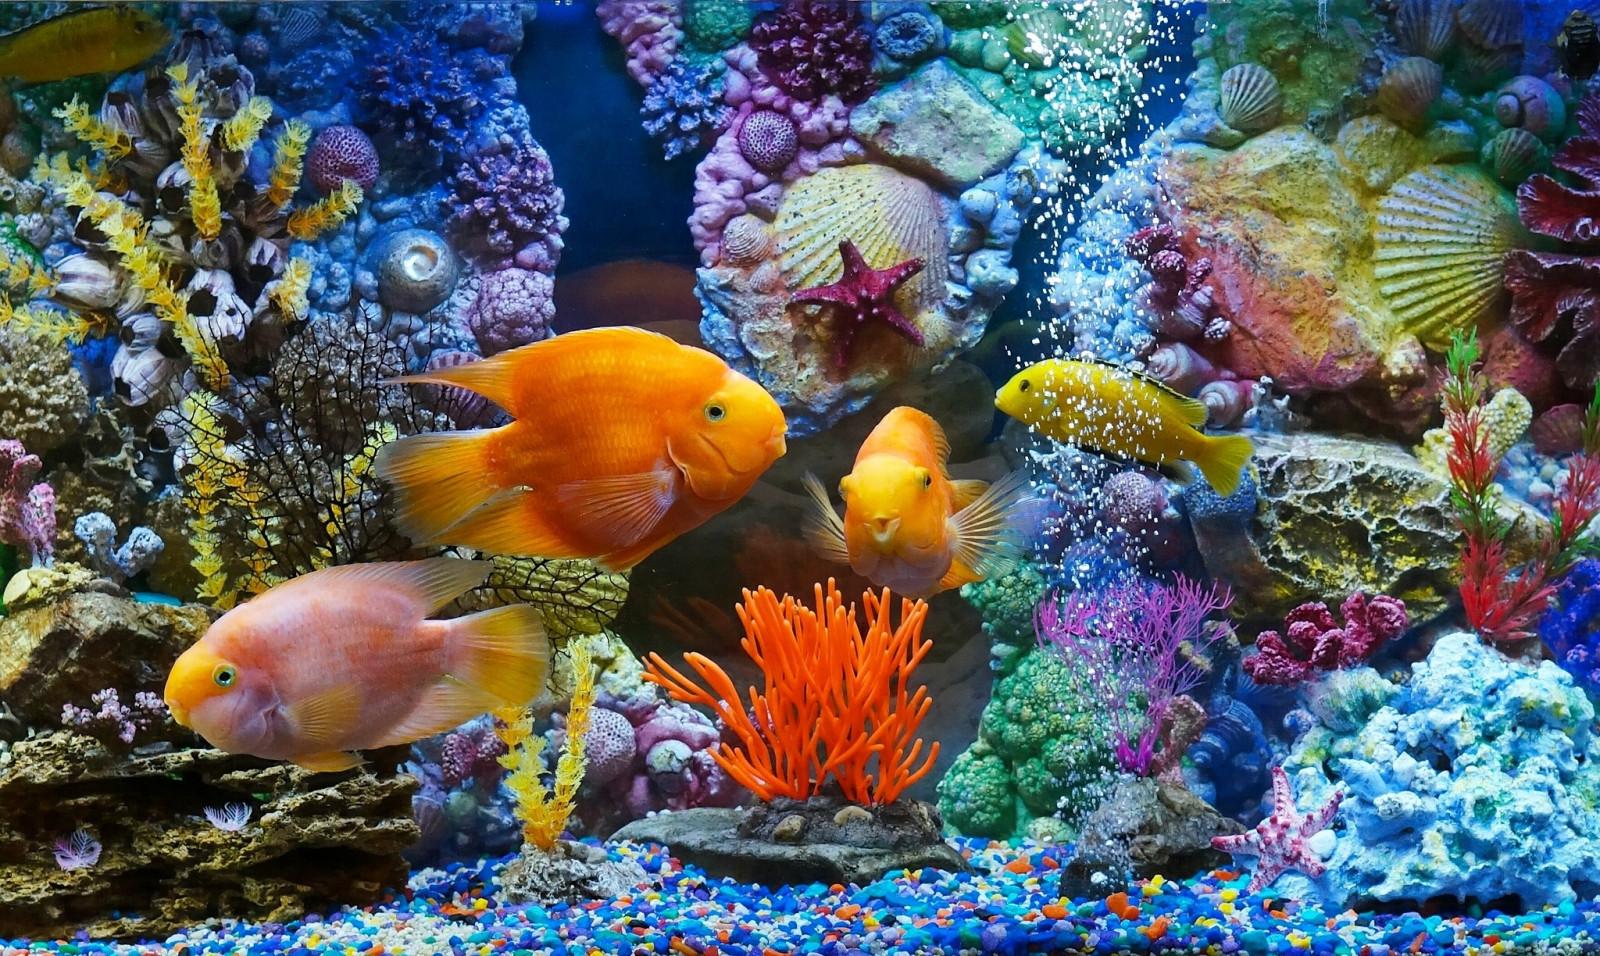 fond d 39 cran poisson sous marin r cif de corail aquarium la biologie faune habitat. Black Bedroom Furniture Sets. Home Design Ideas